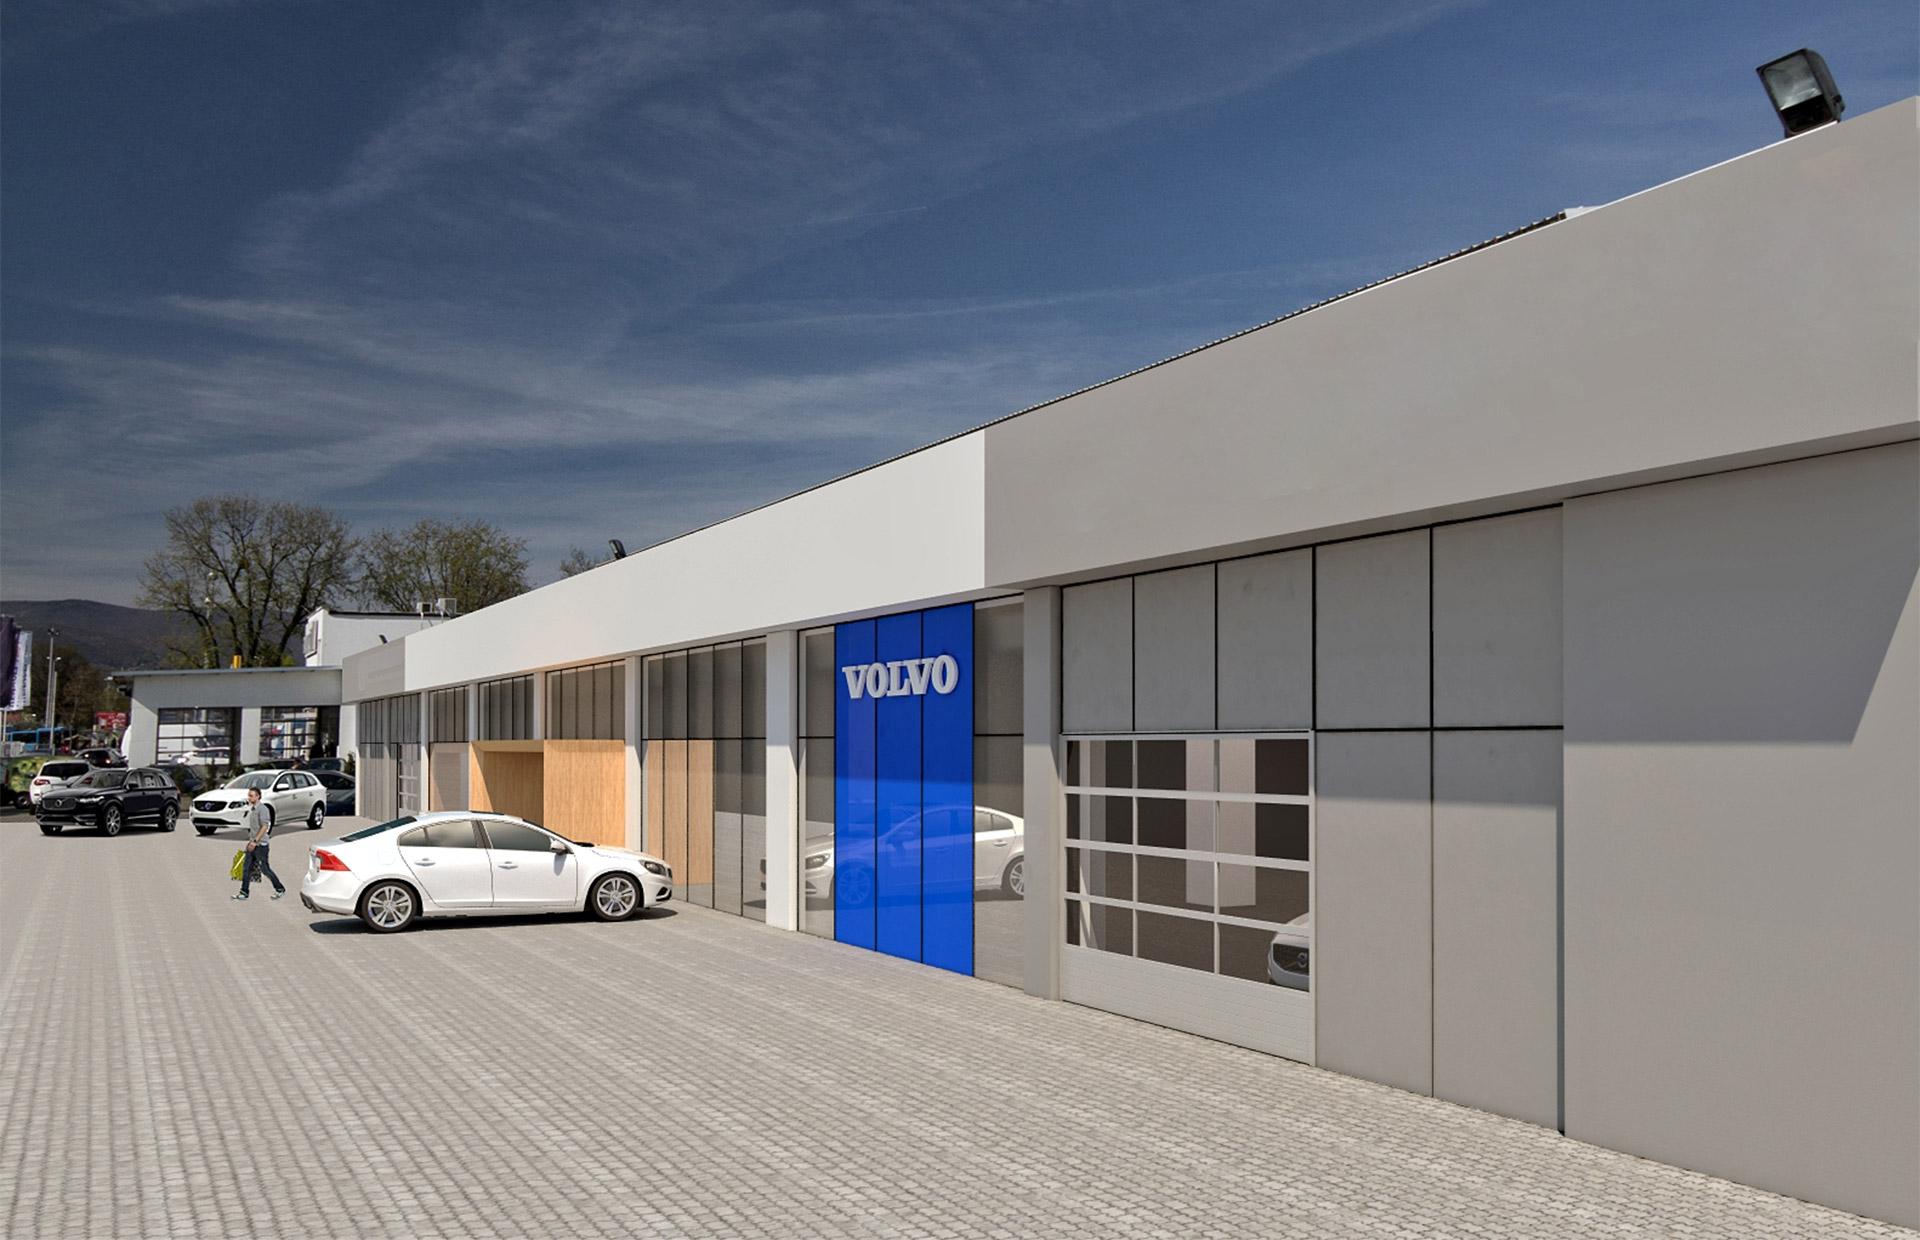 Volvo_OPT_03